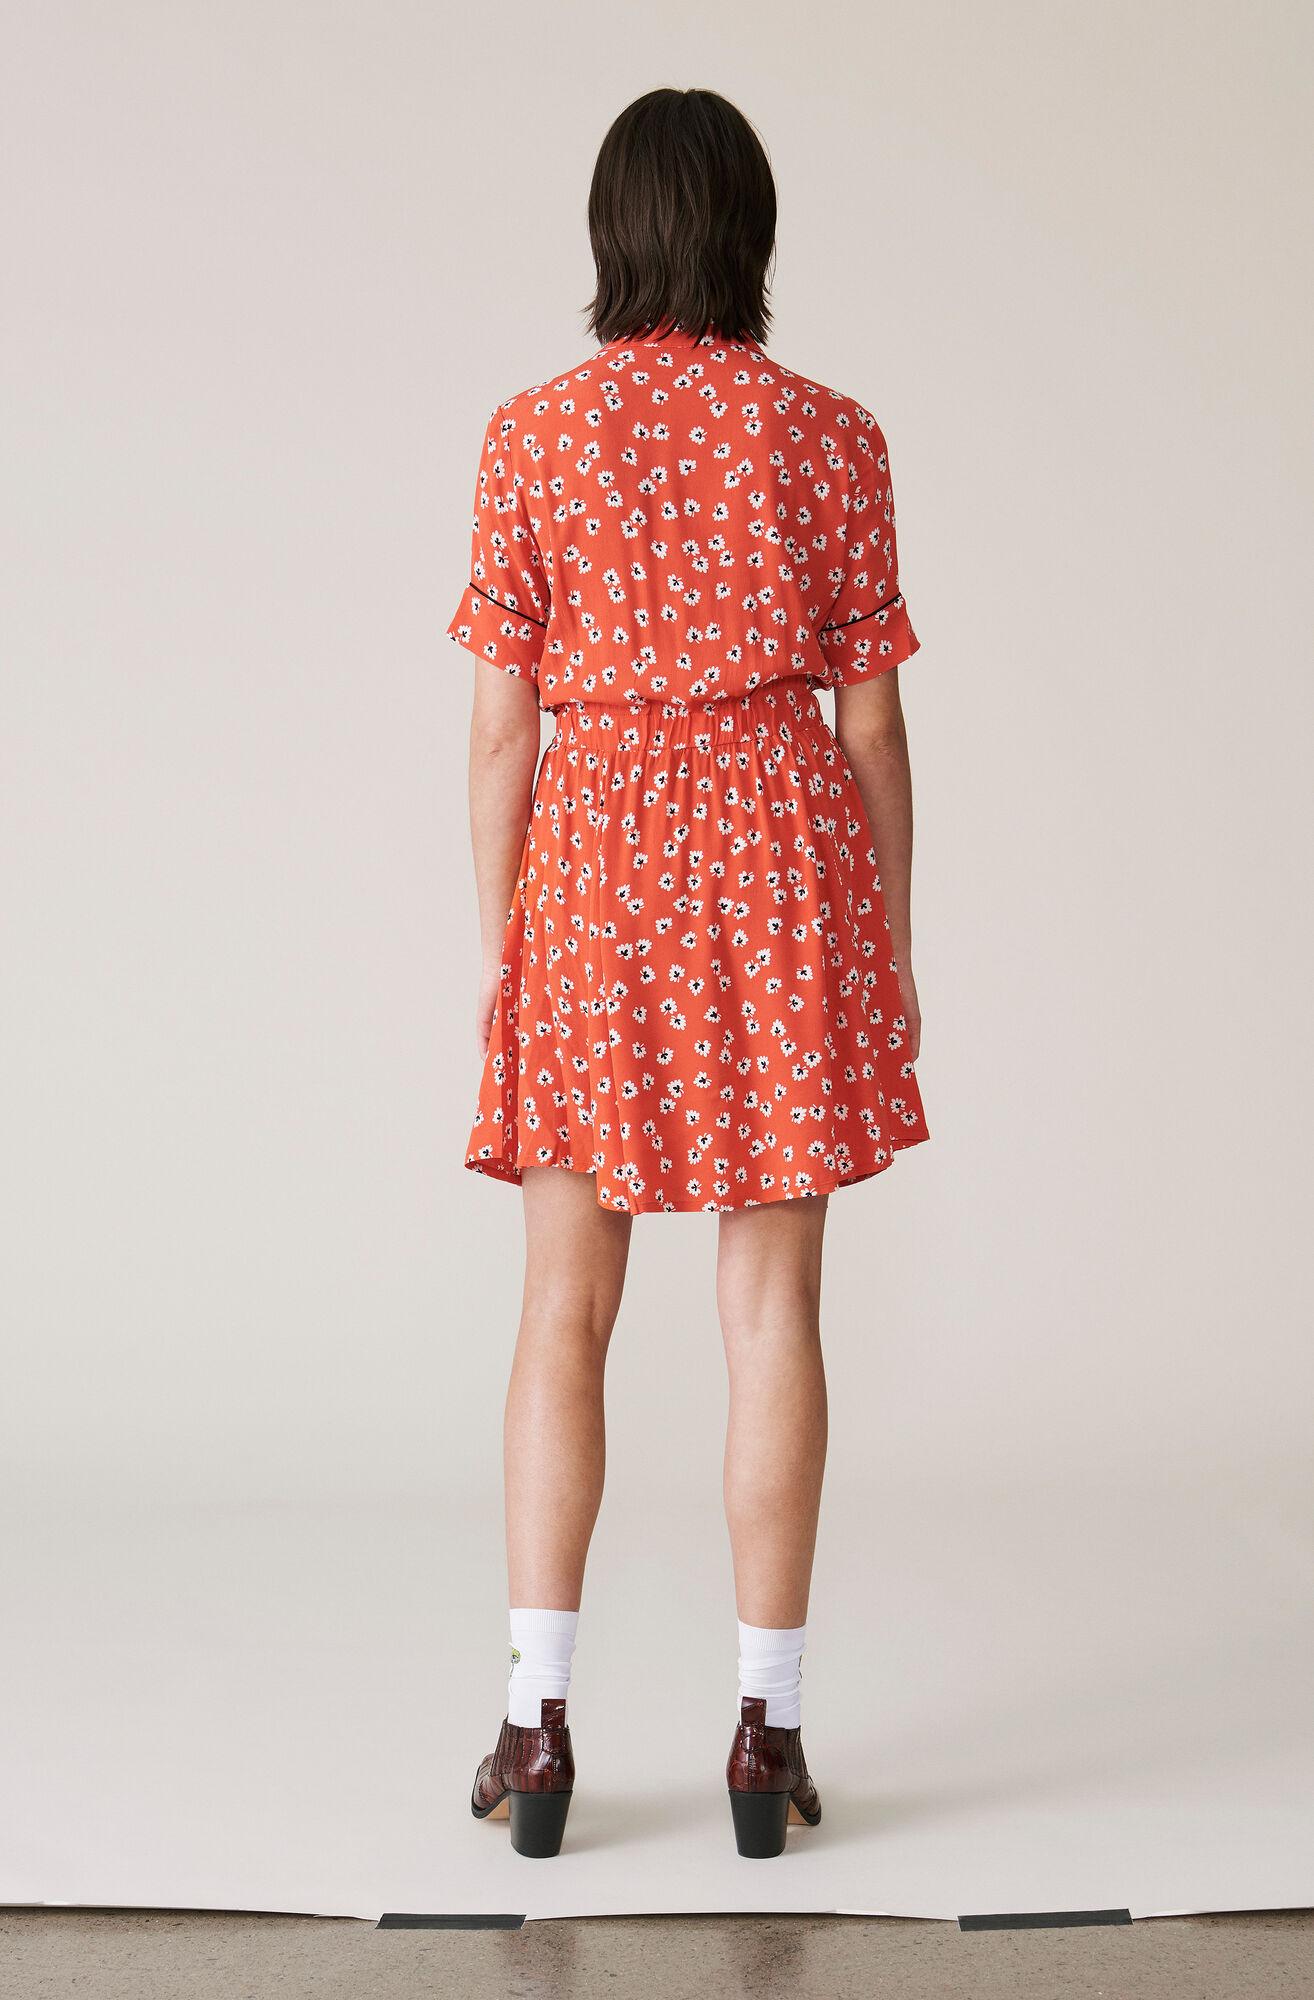 Silvery Crepe Twist Dress, Big Apple Red, hi-res